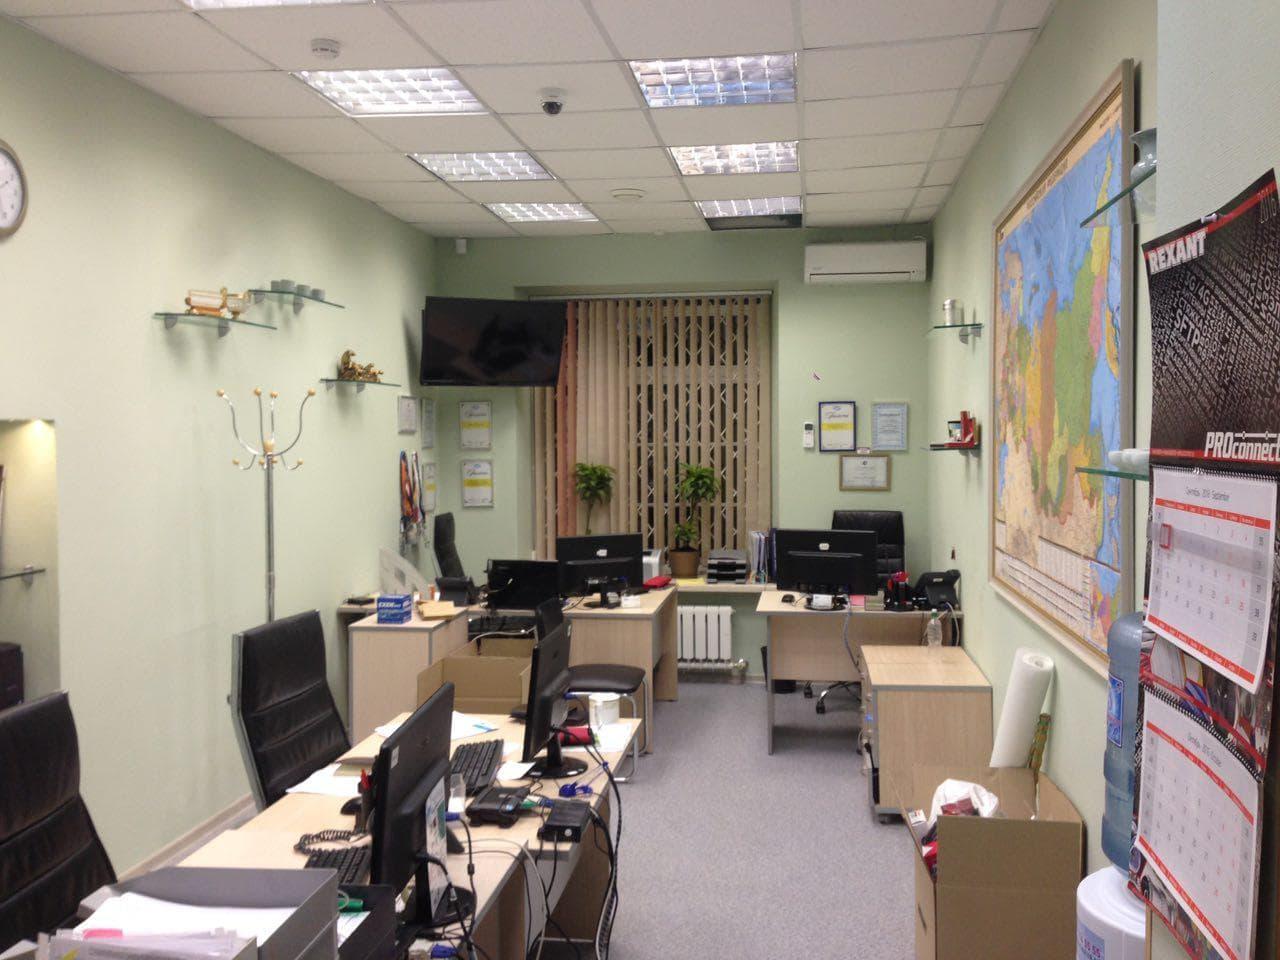 Ремонт офиса по разработанному проекту. г.Москва.